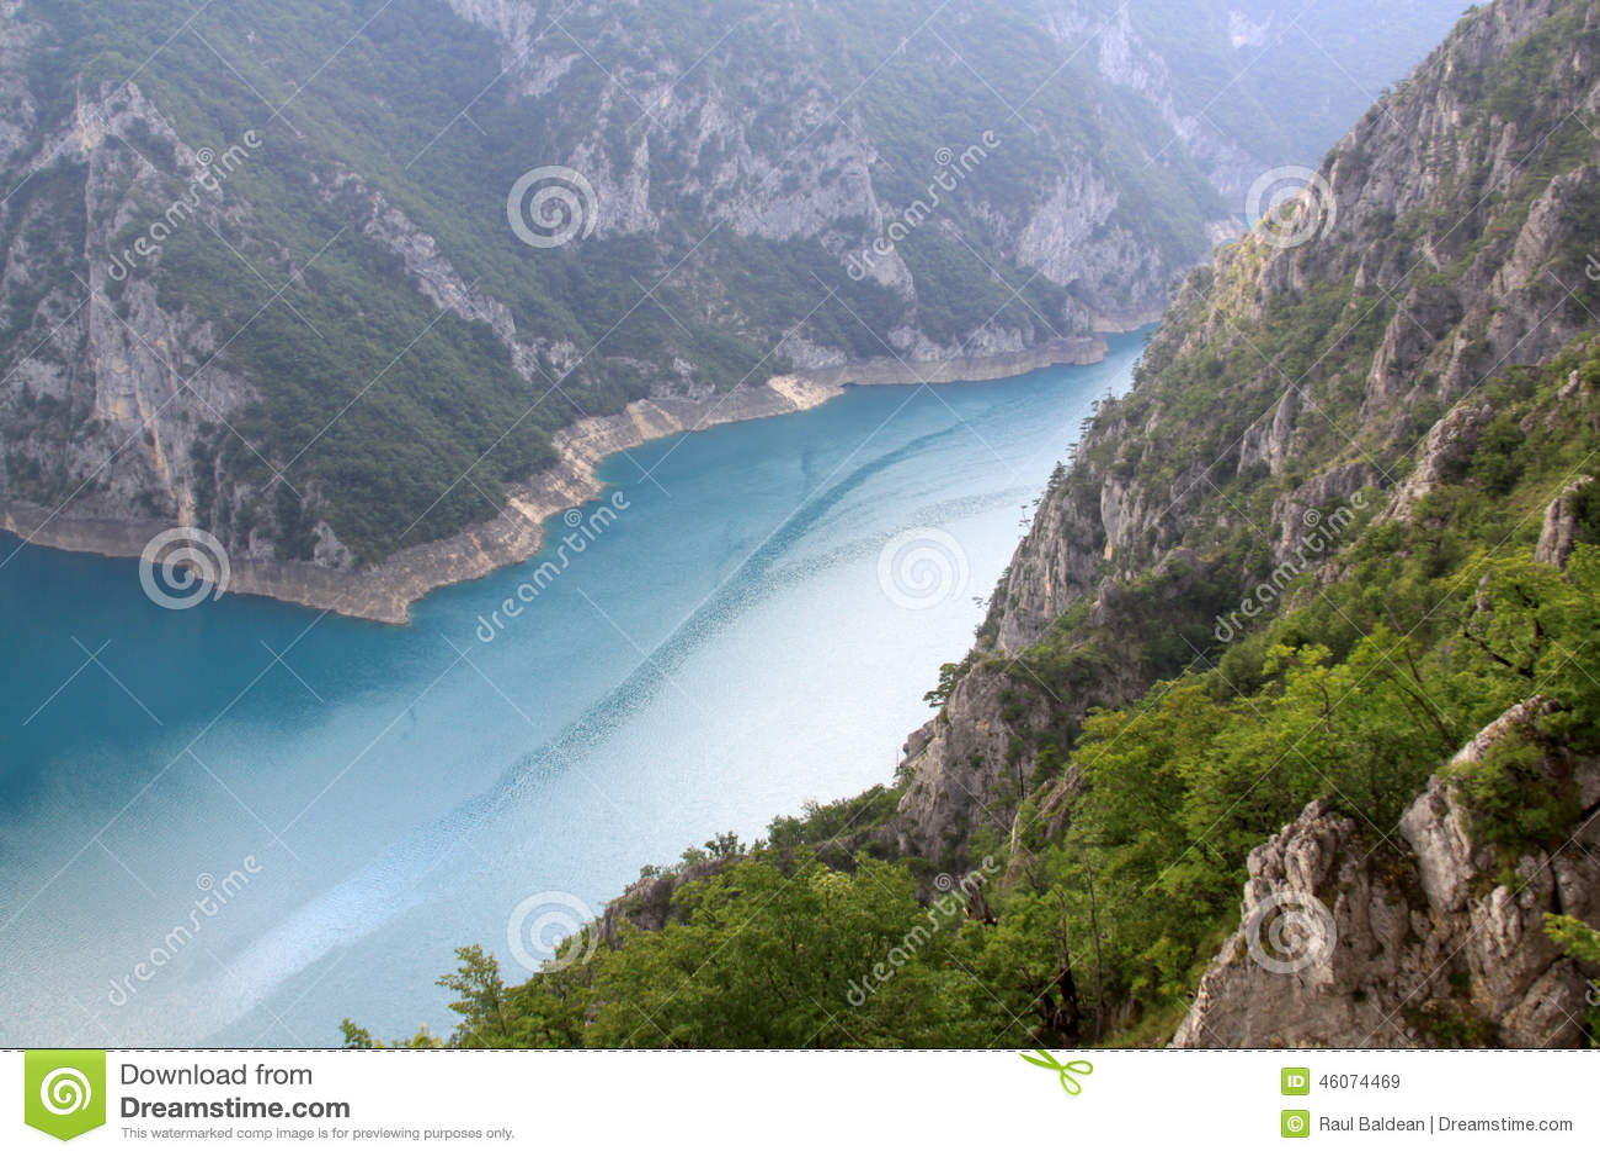 Pivsko Jezero, Durmitor National Park, Montenegro